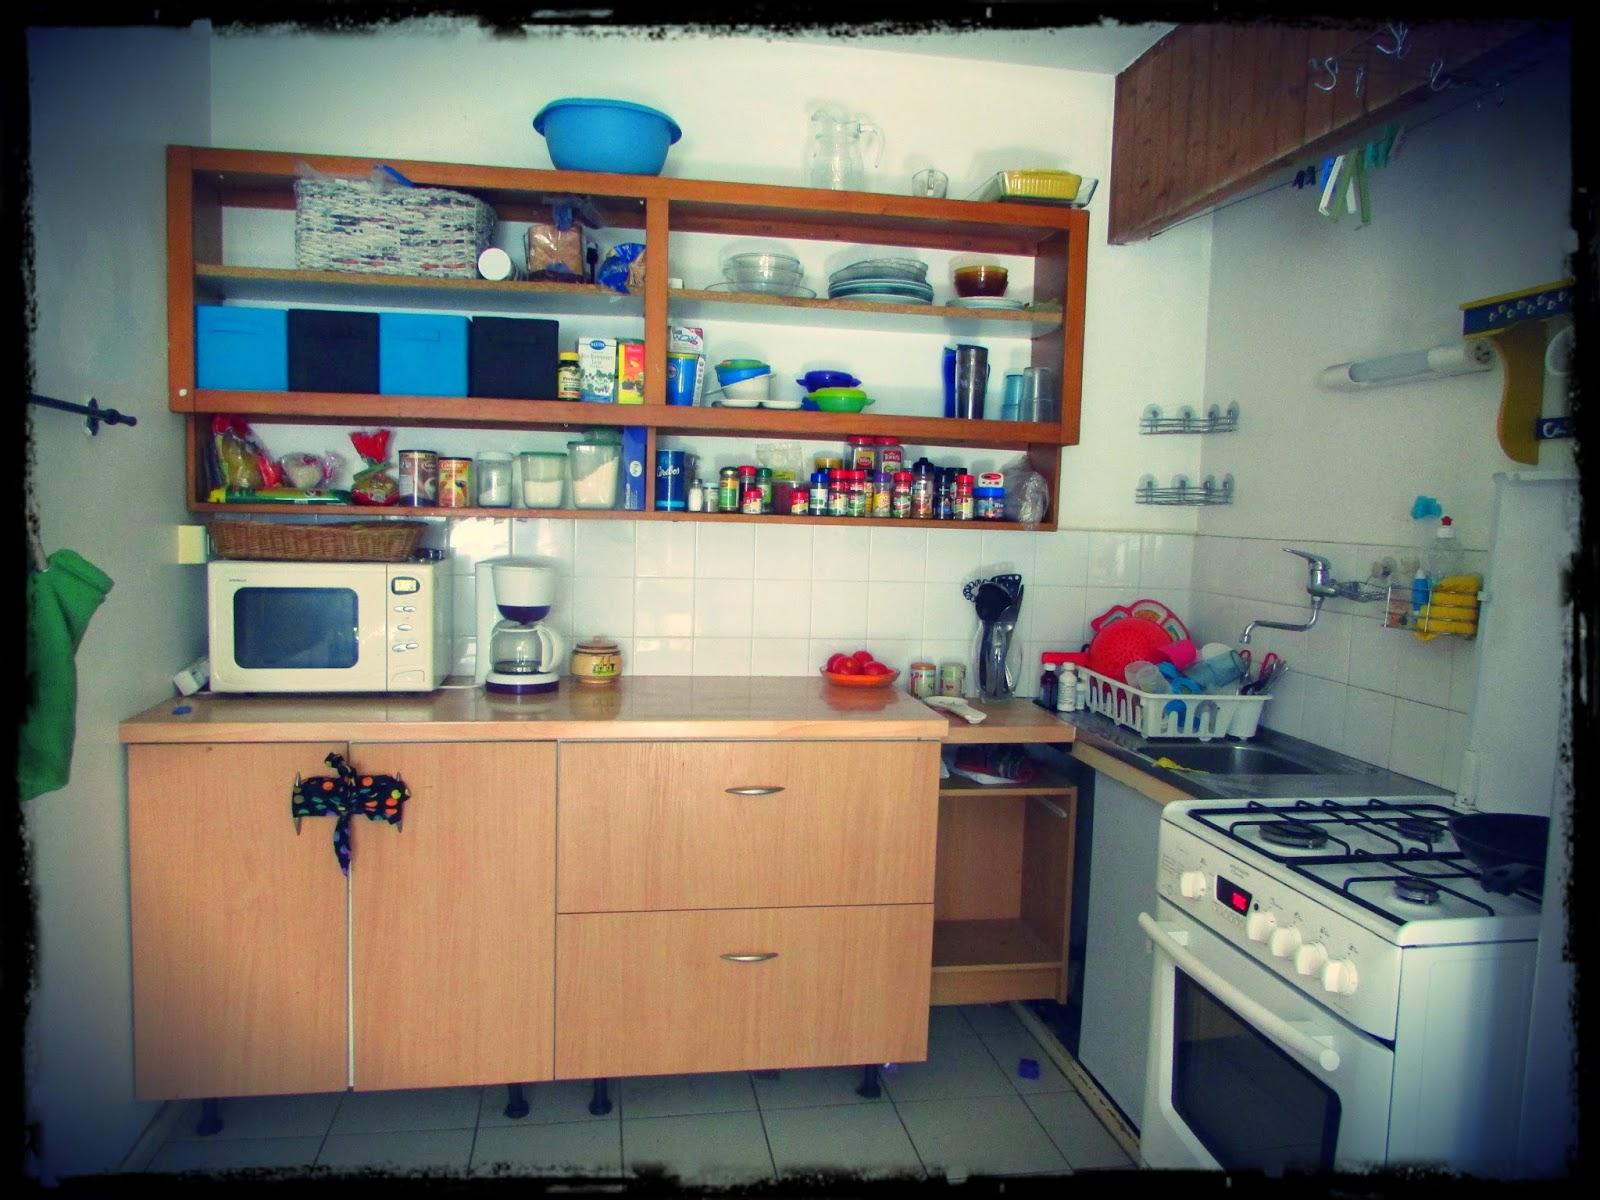 Our cozy kitchen